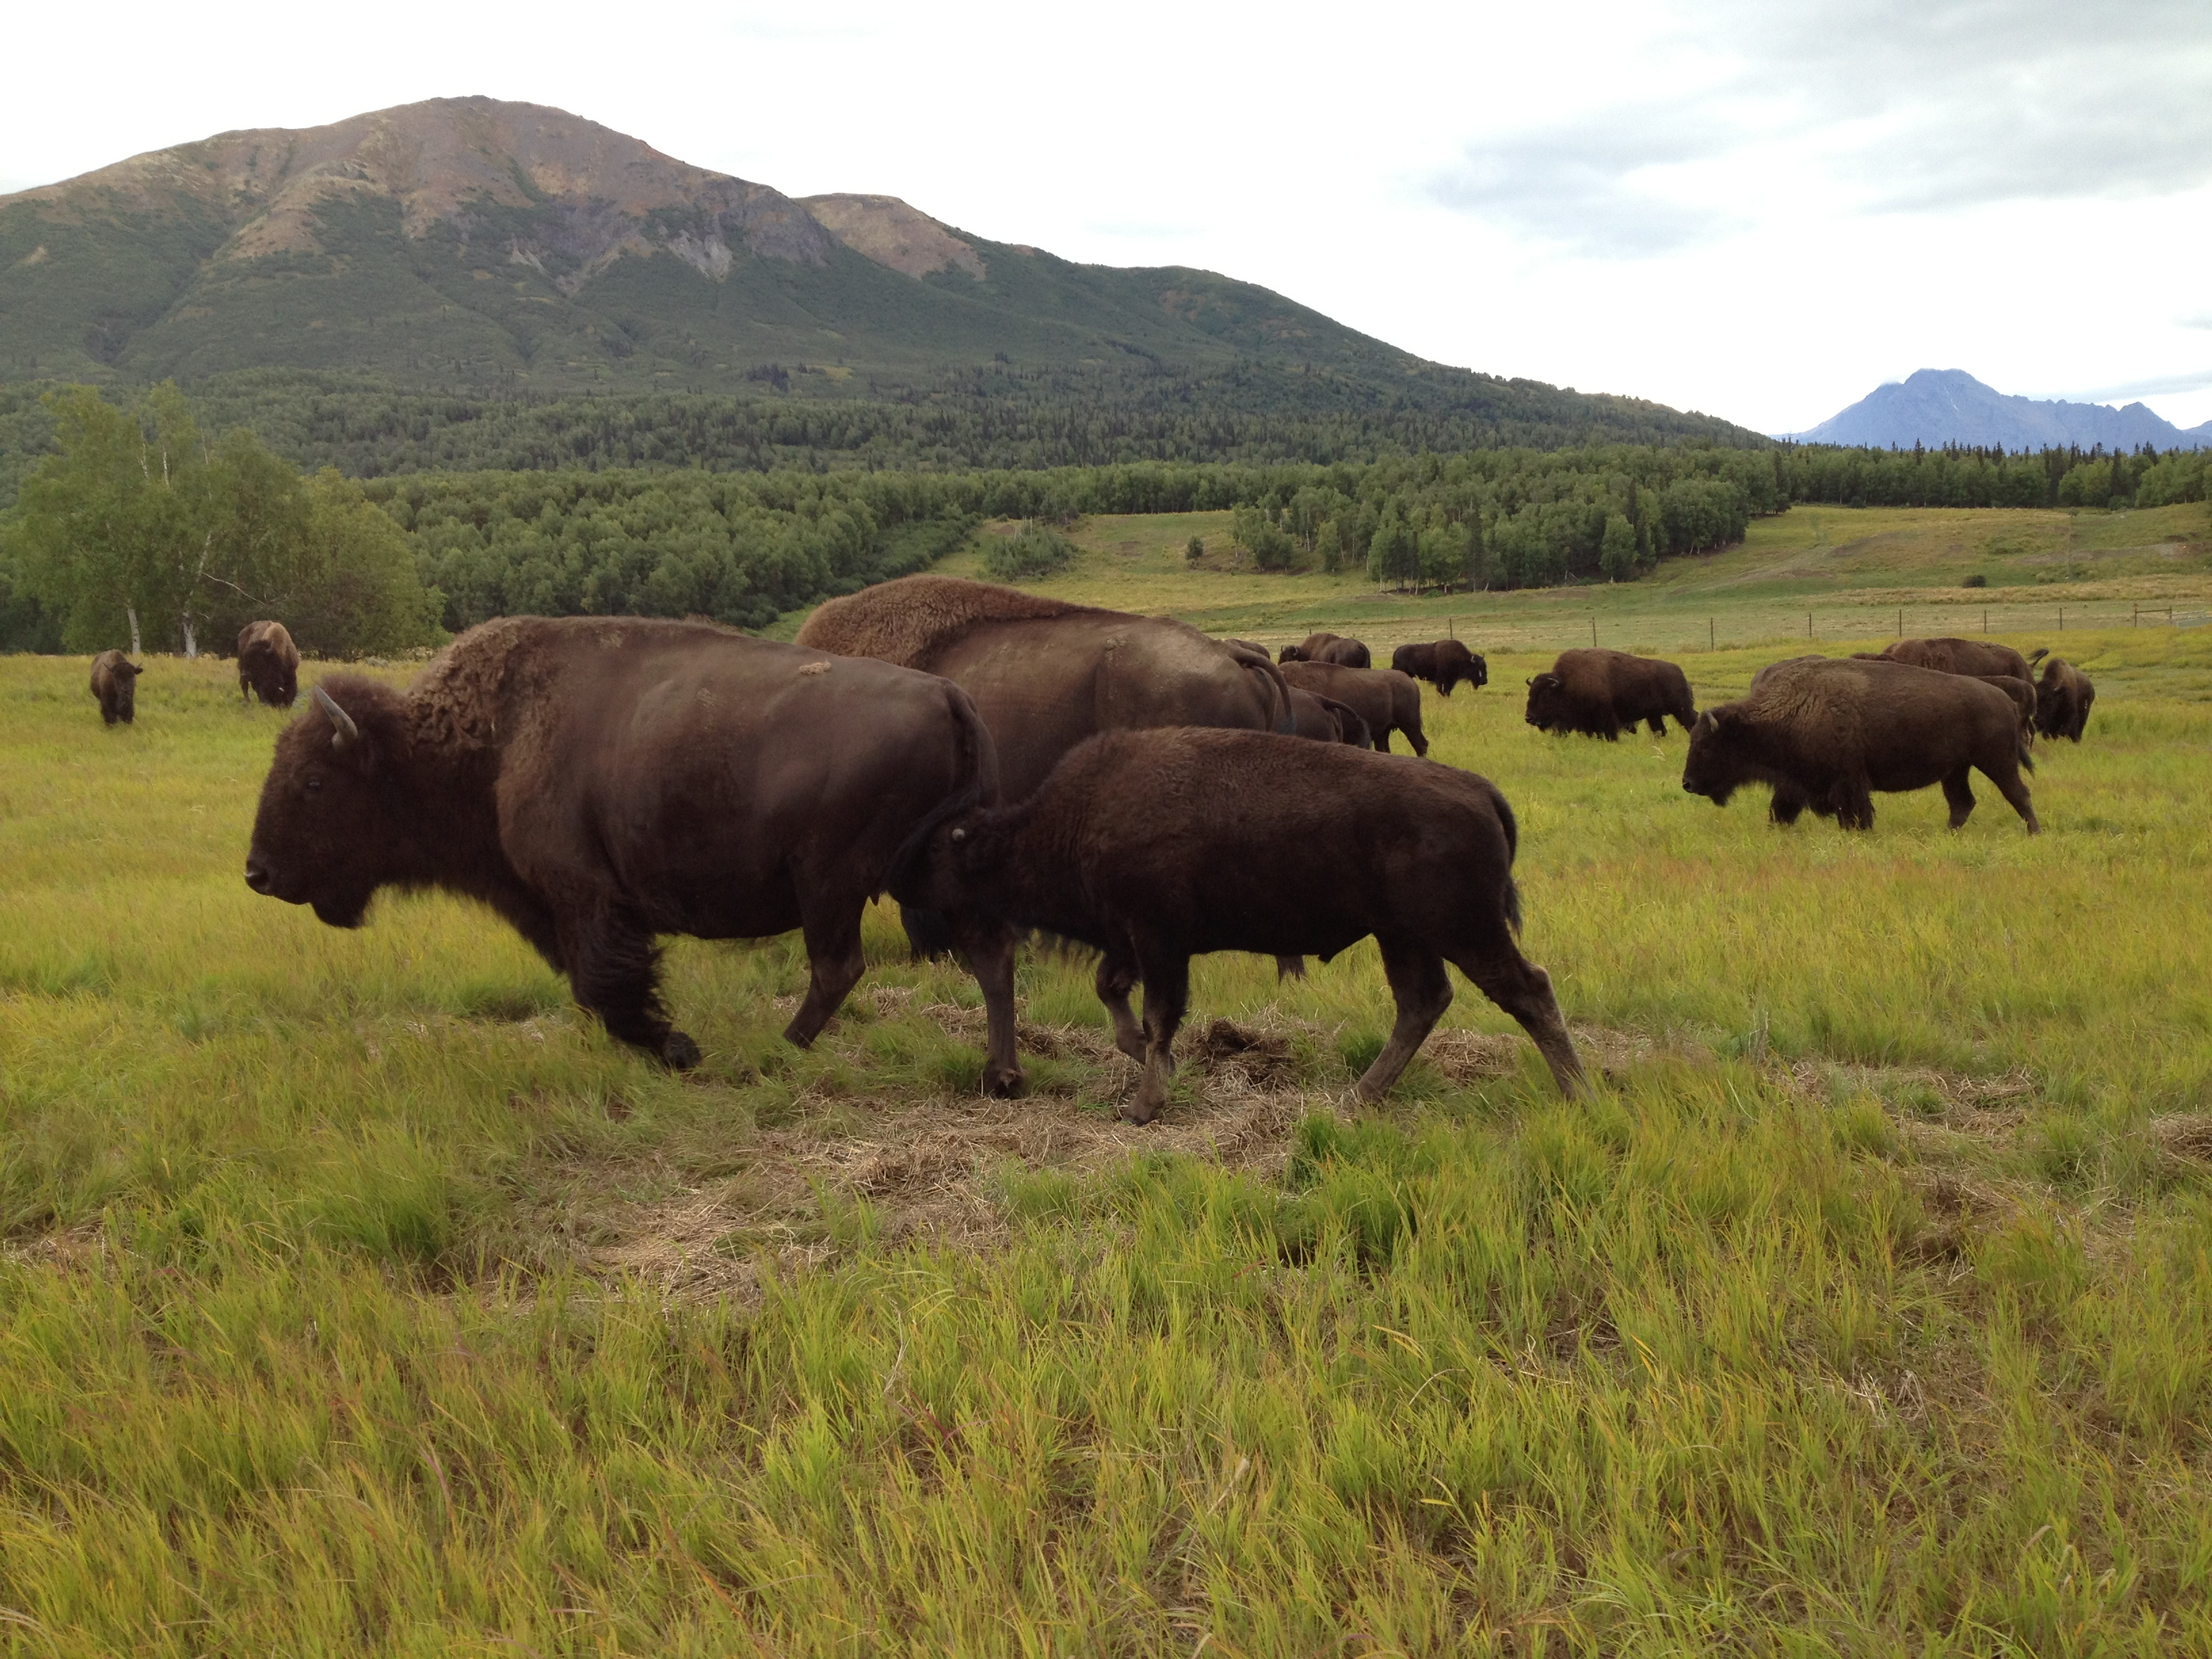 Some of Pettit's bison grazing on ranchland near Palmer (Photo by Ellen Lockyer, Alaska Public Media - Anchorage)